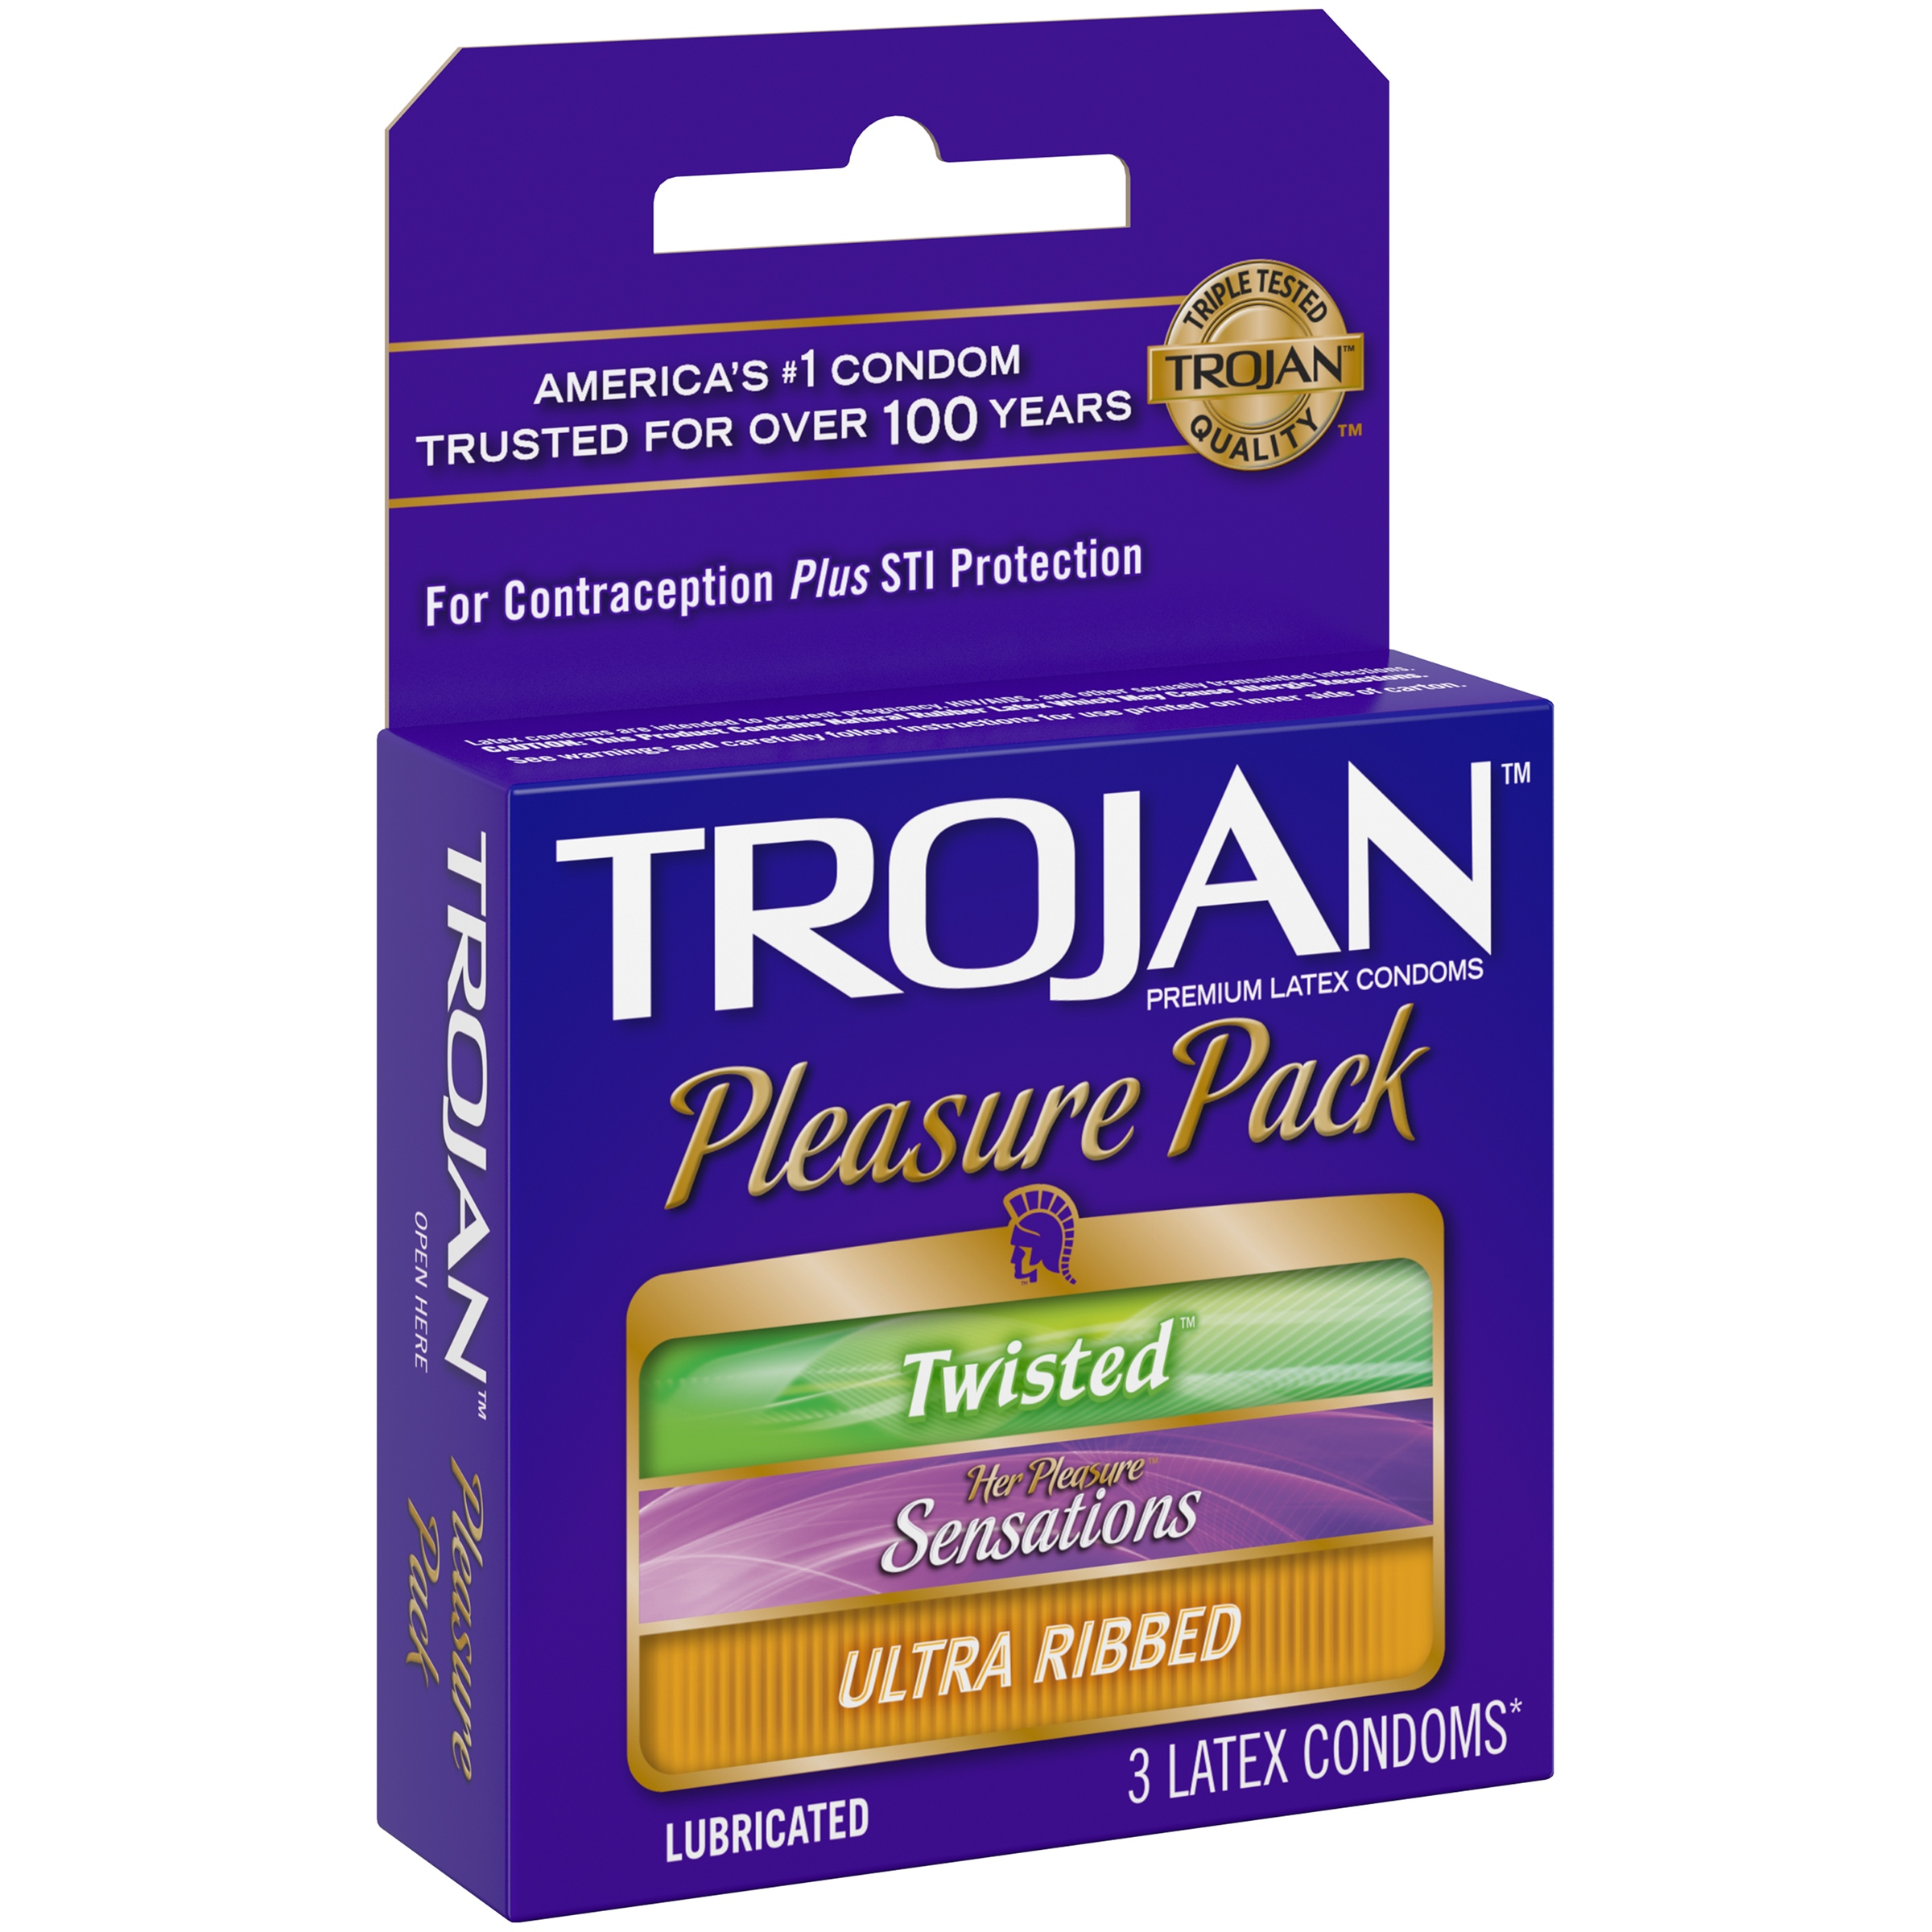 Trojan Pleasure Pack Assorted Lubricated Latex Condoms - 3 ct